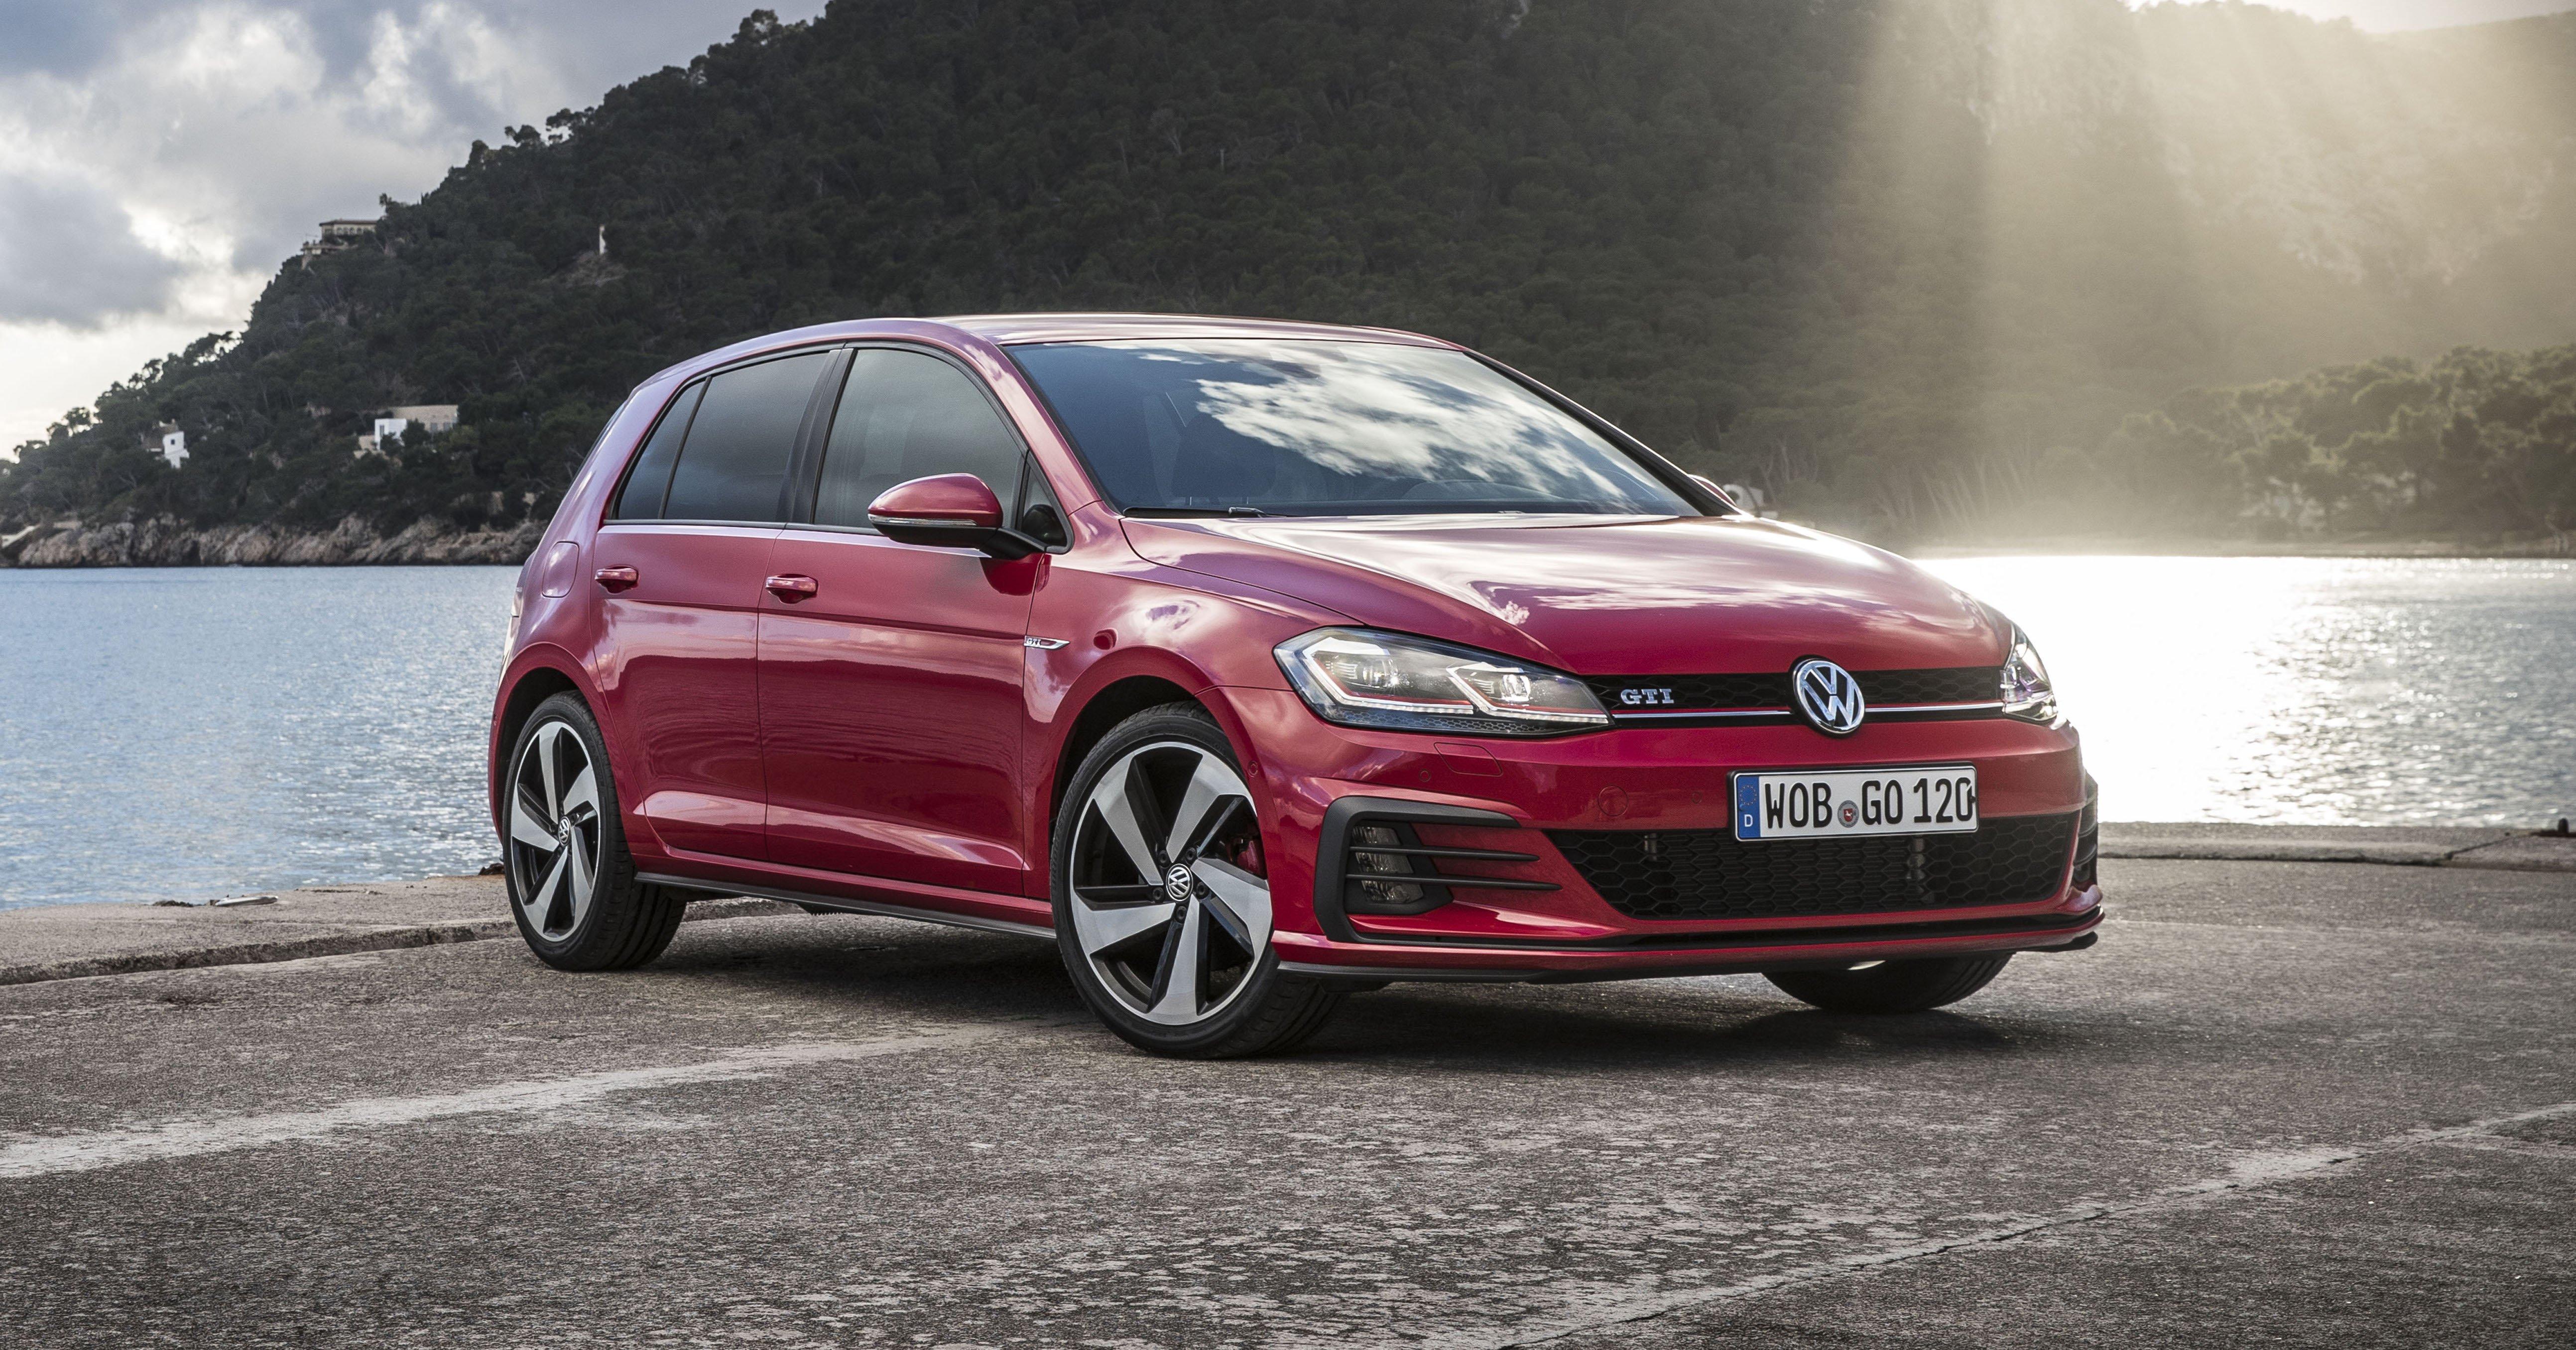 2017 Volkswagen Golf Gti R Pricing And Specs Three Door Gti Returns Golf R Wagon Too Update Caradvice